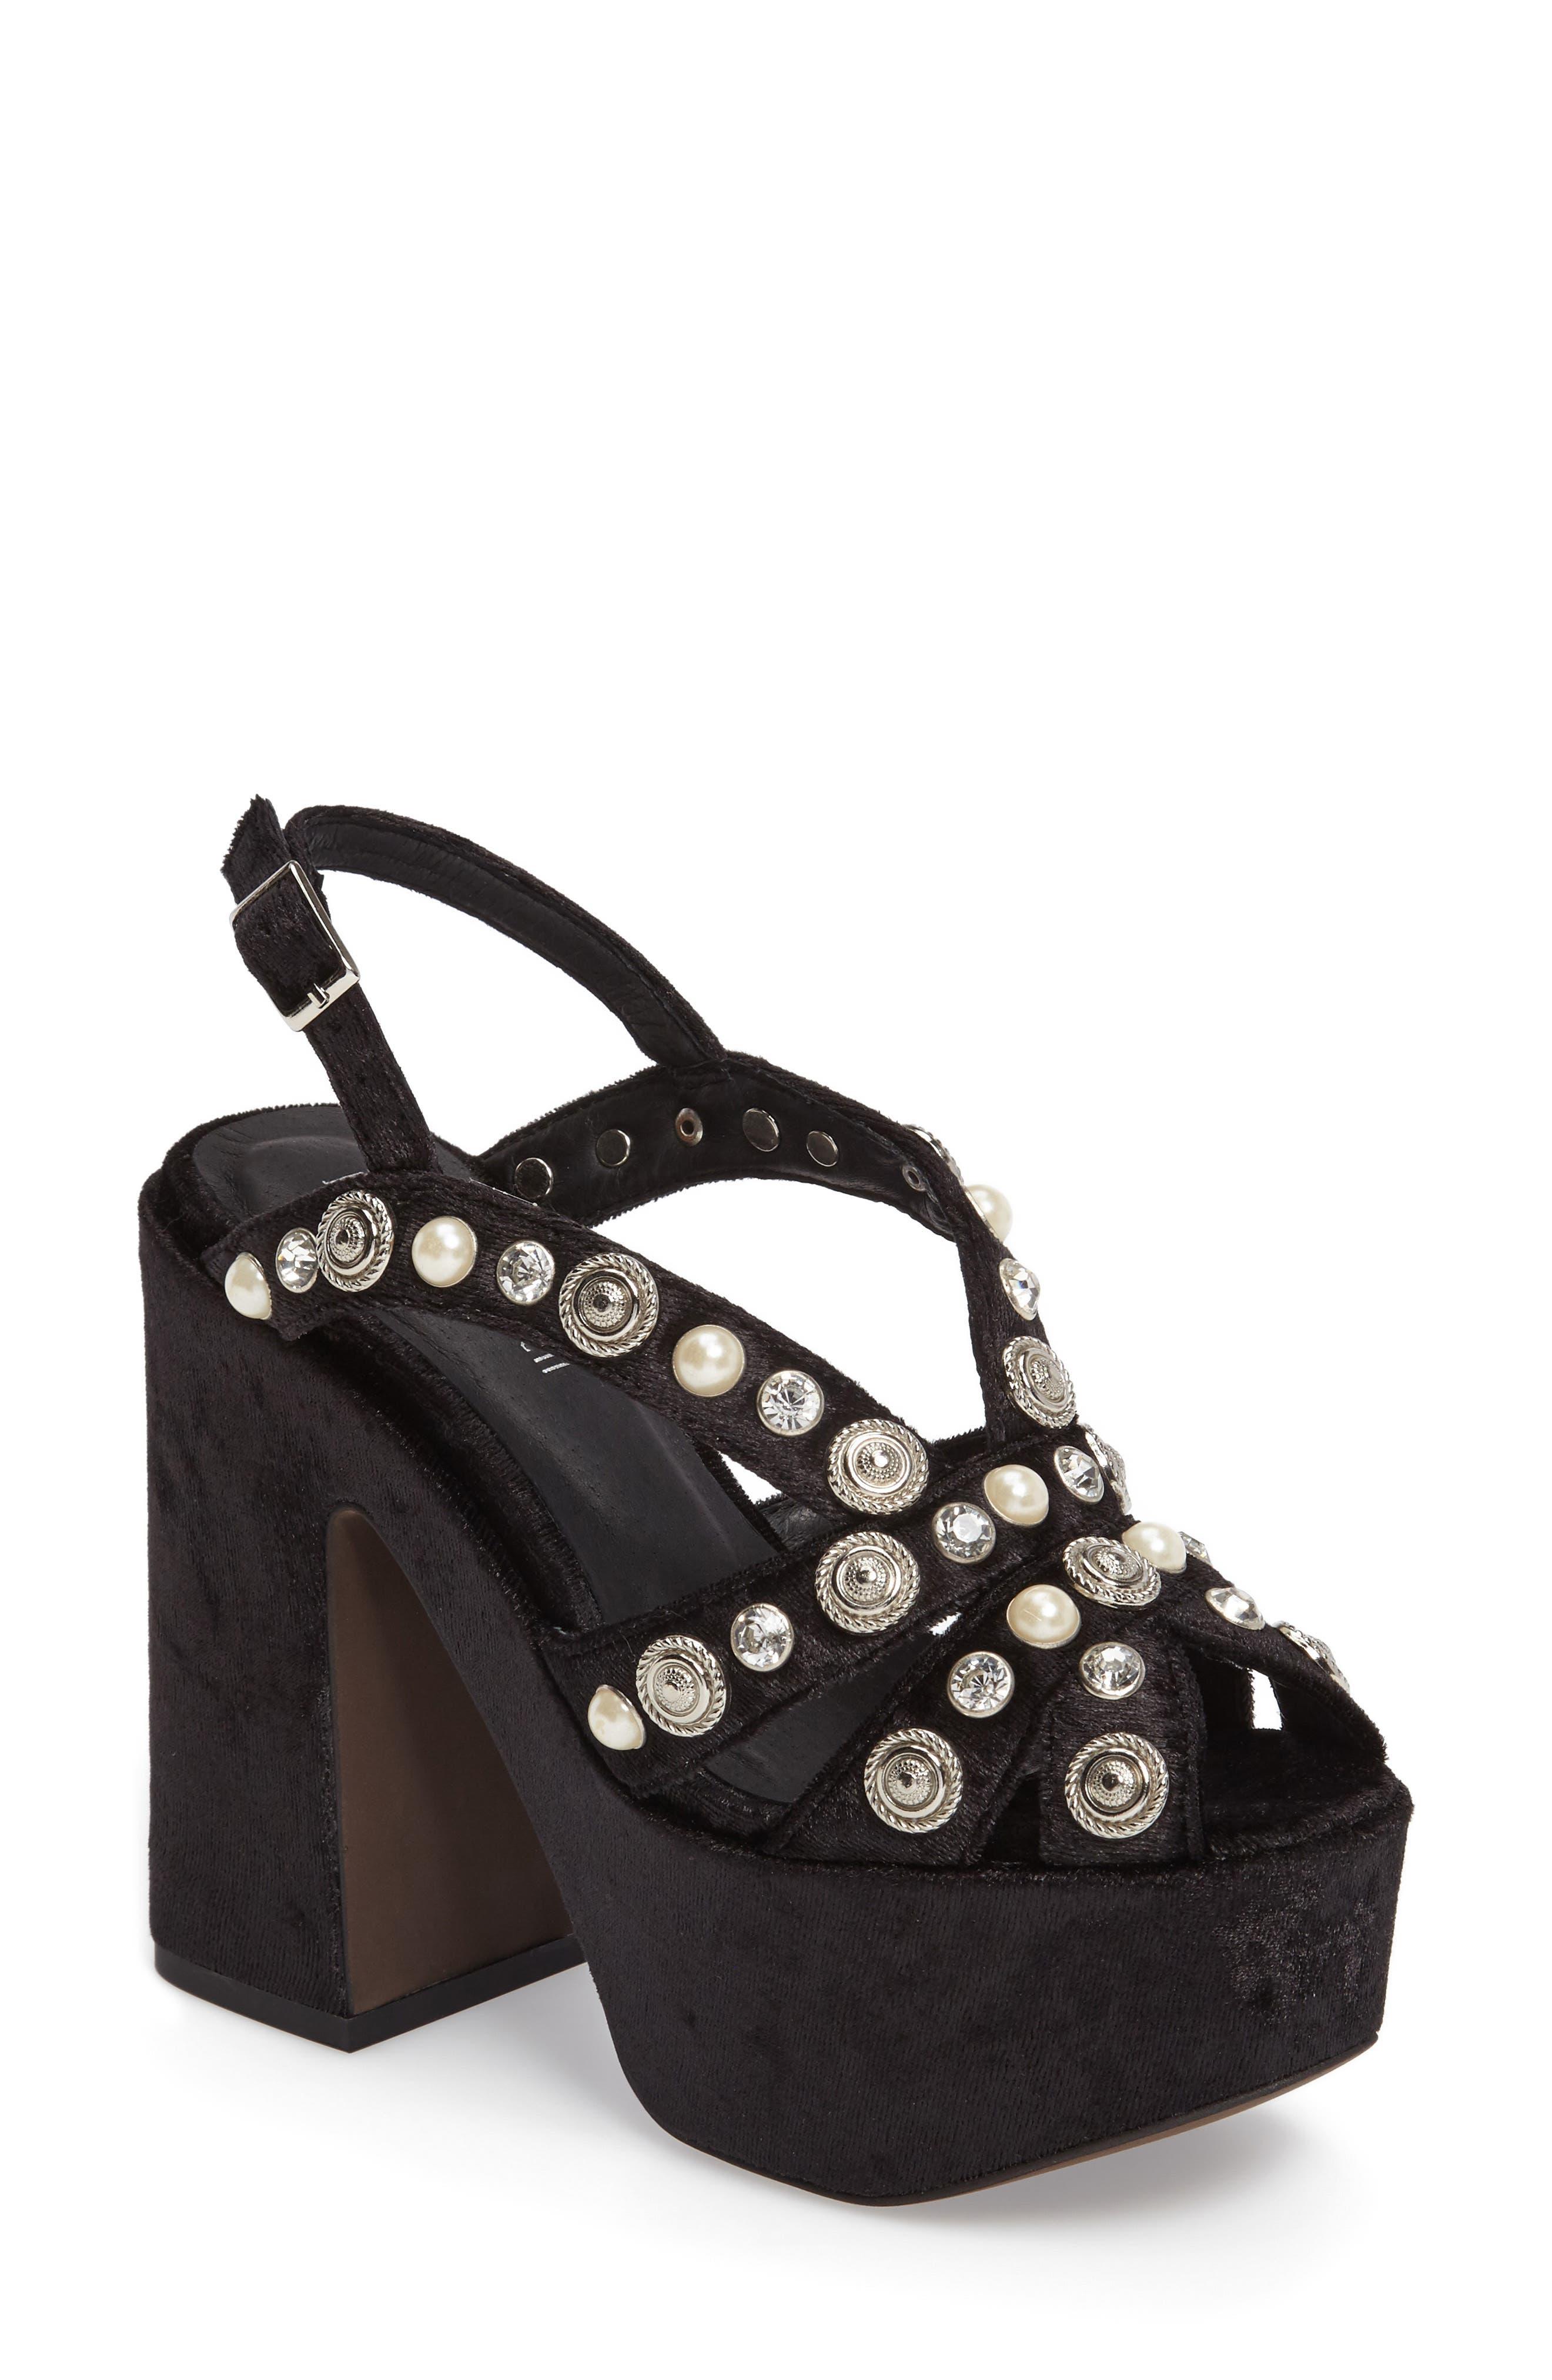 Main Image - Jeffrey Campbell Briston Embellished Platform Sandal (Women)